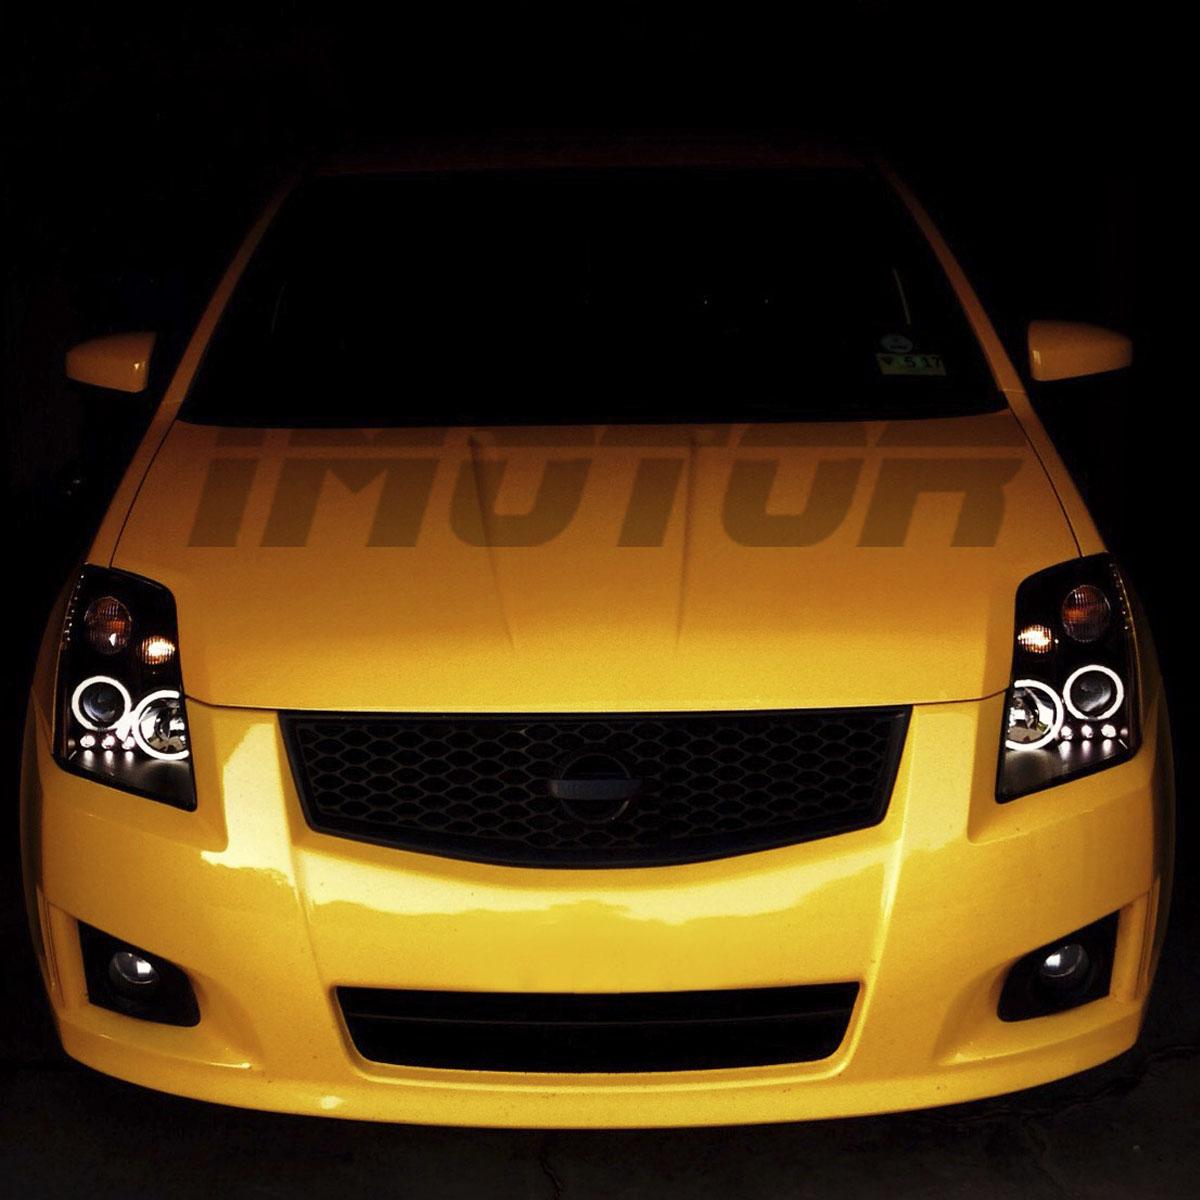 07 Nissan Maxima >> [Dual CCFL Halo] For 2007 2008 2009 2010 Nissan Sentra LED Projector Headlights